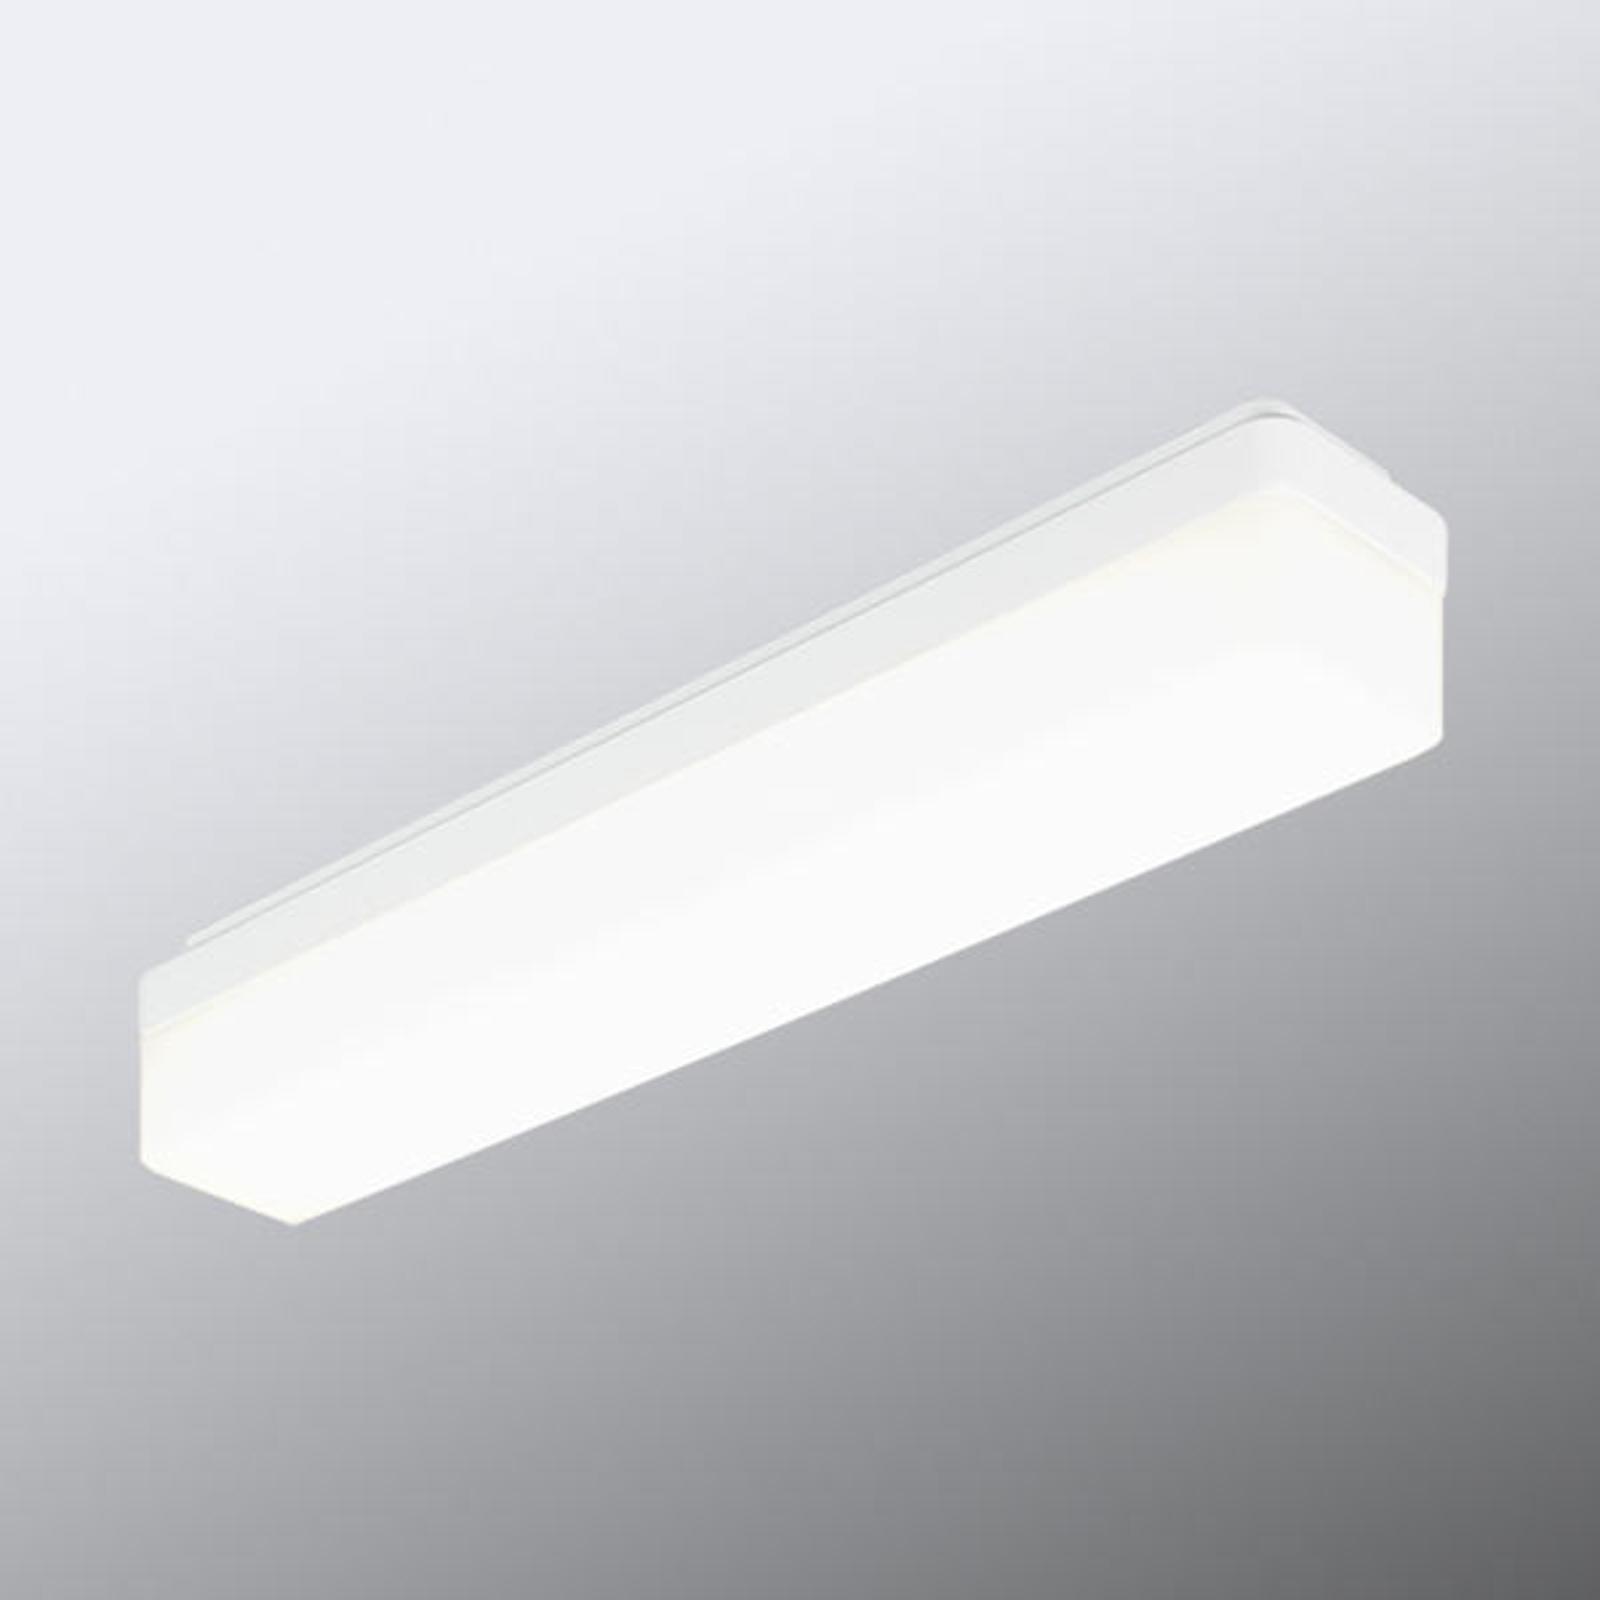 LED-seinävalaisin A70-W365 LED 1000 HF 14W 3000K